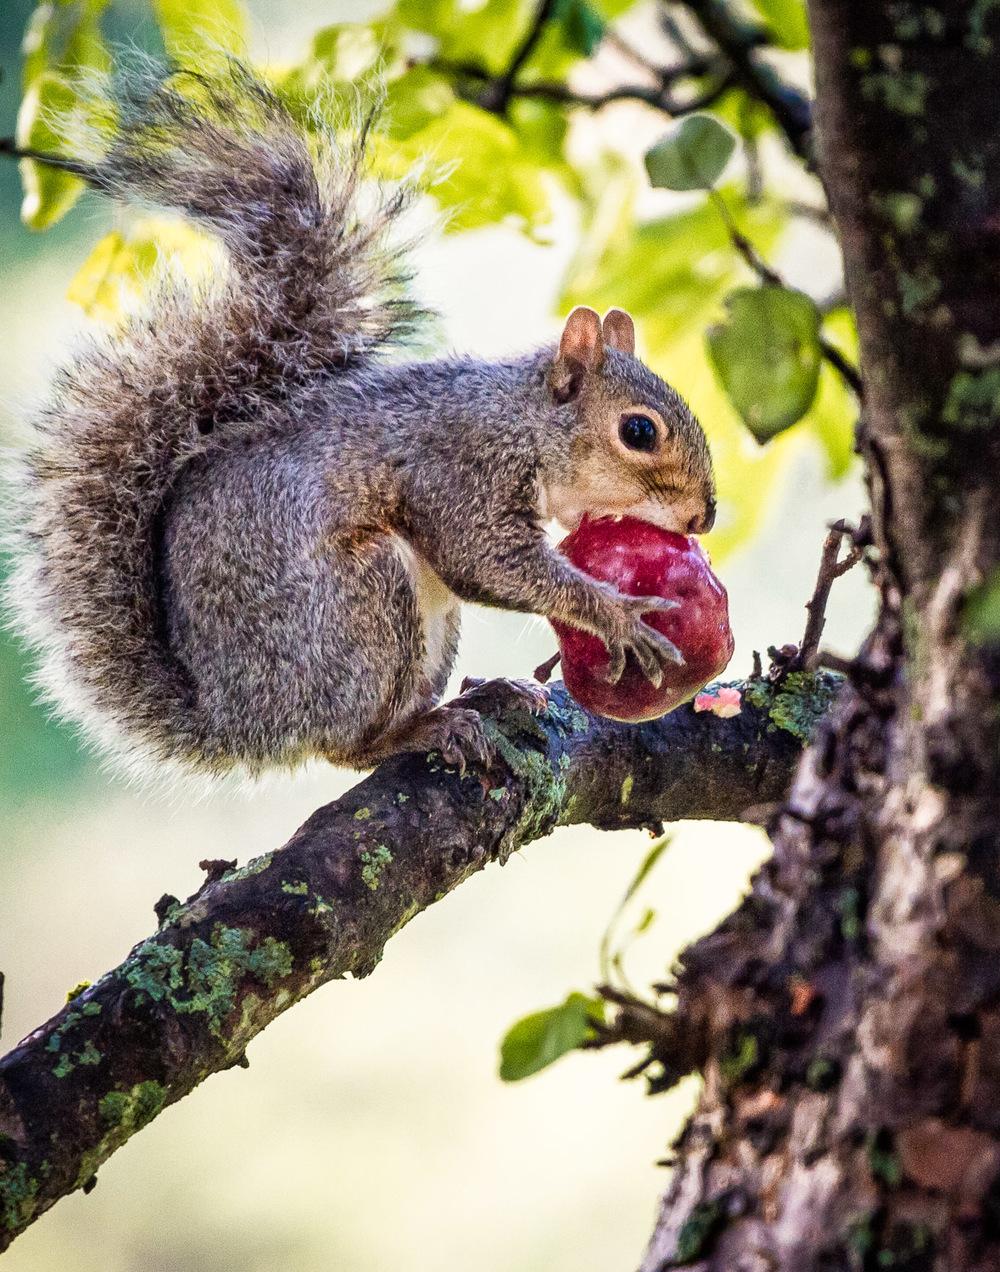 Big Apple, Little Squirrel Lincoln, Massachusetts